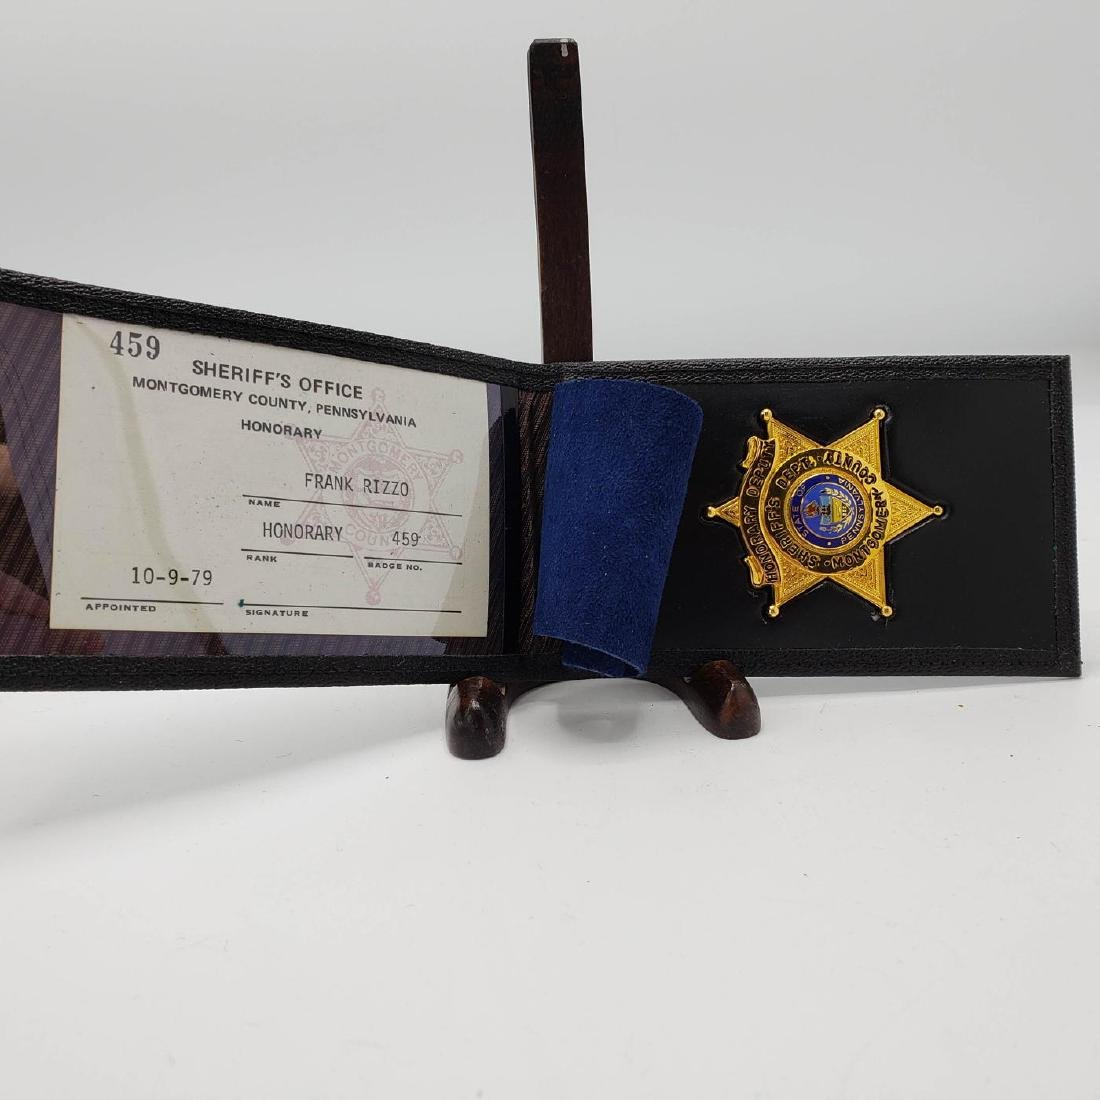 Montgomery County Sheriffs Office Frank Rizzo Hon - 2